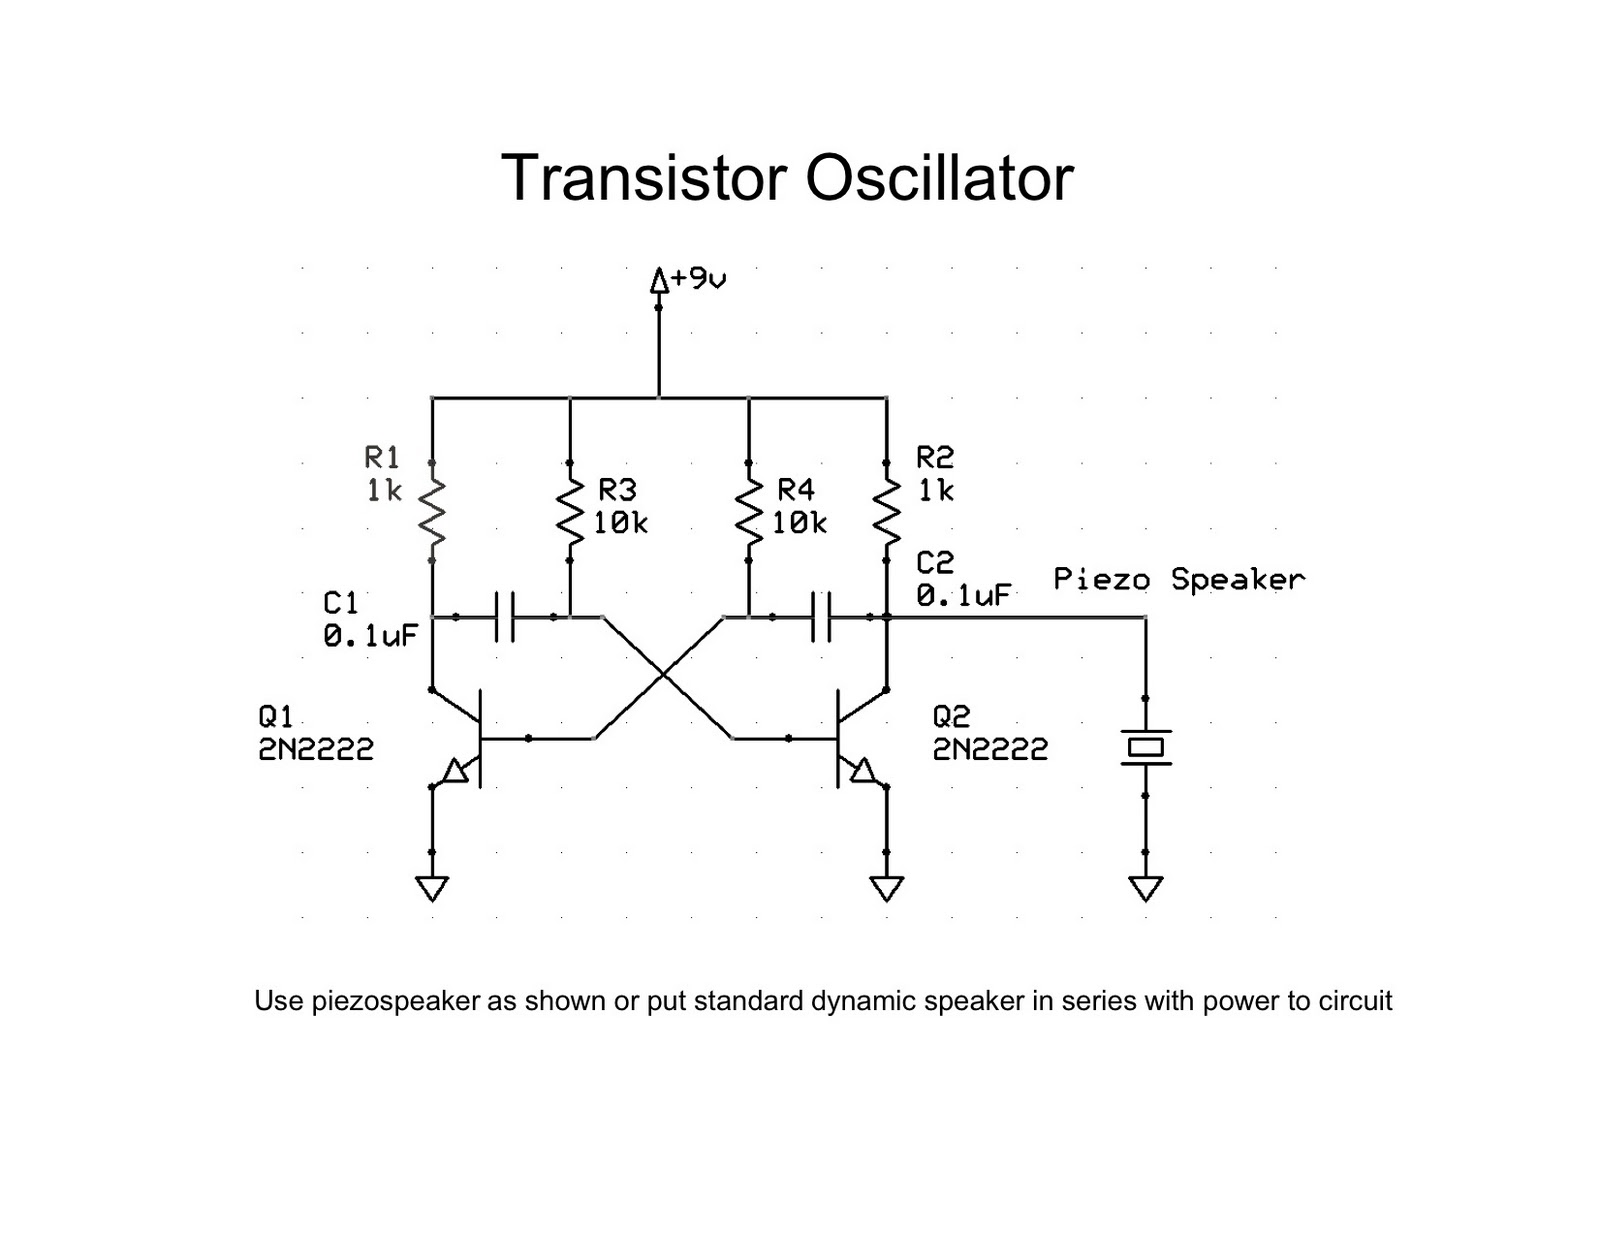 Un oscilador que oscila demasiado Transistor+oscillator